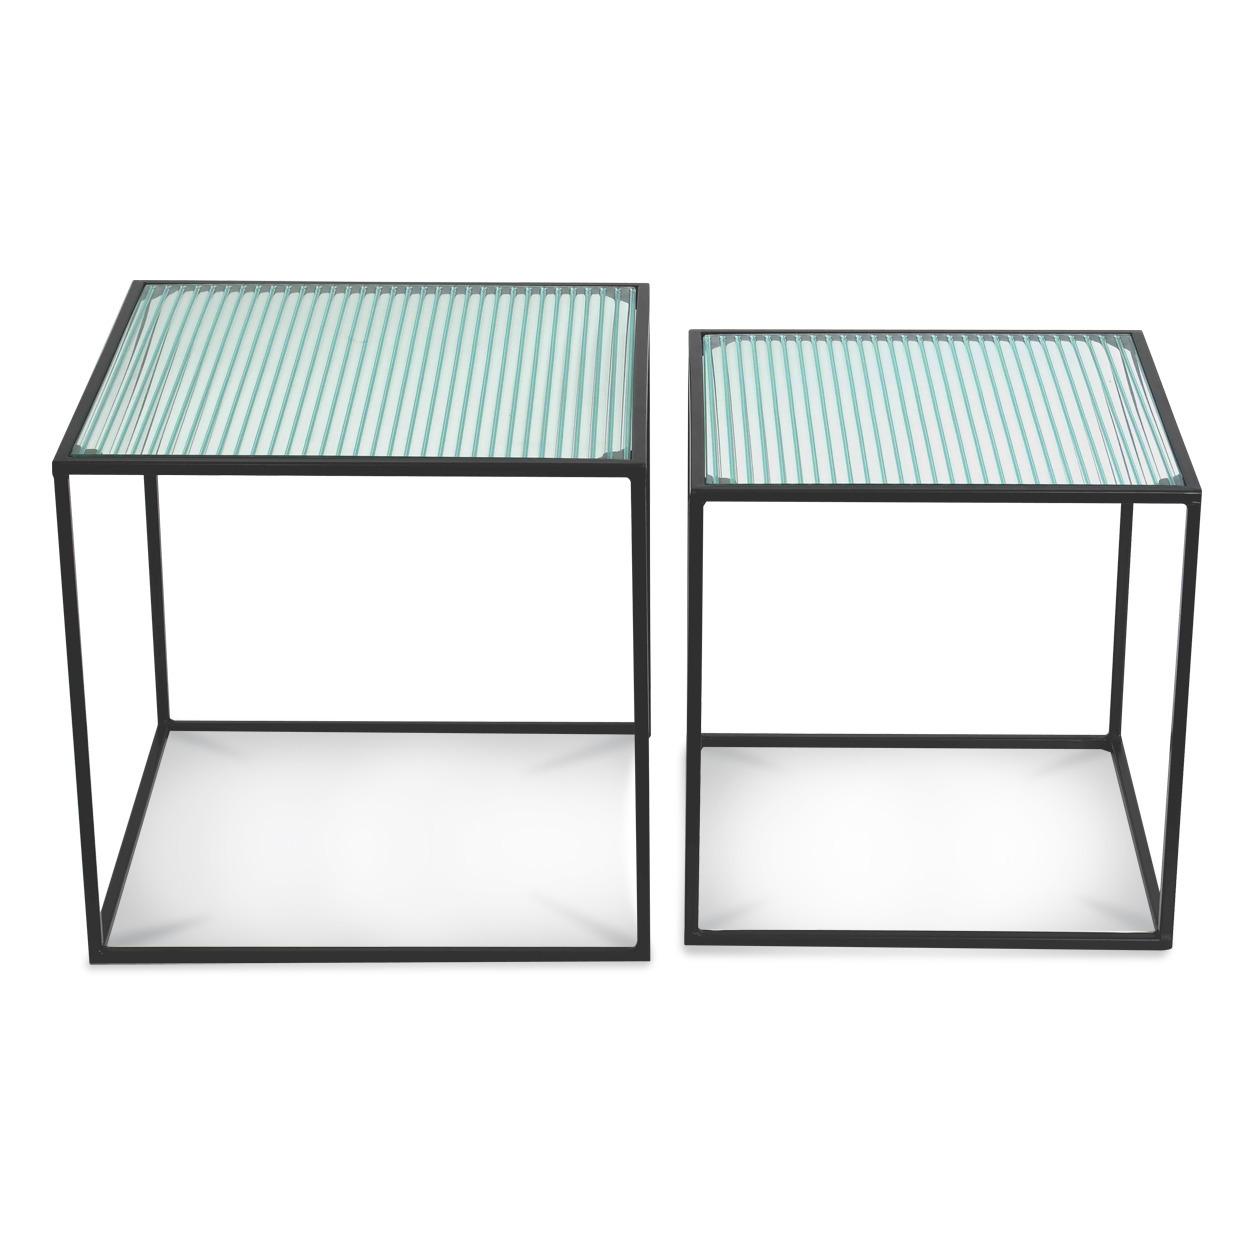 Tables basses gigognes en verre - Set de 2